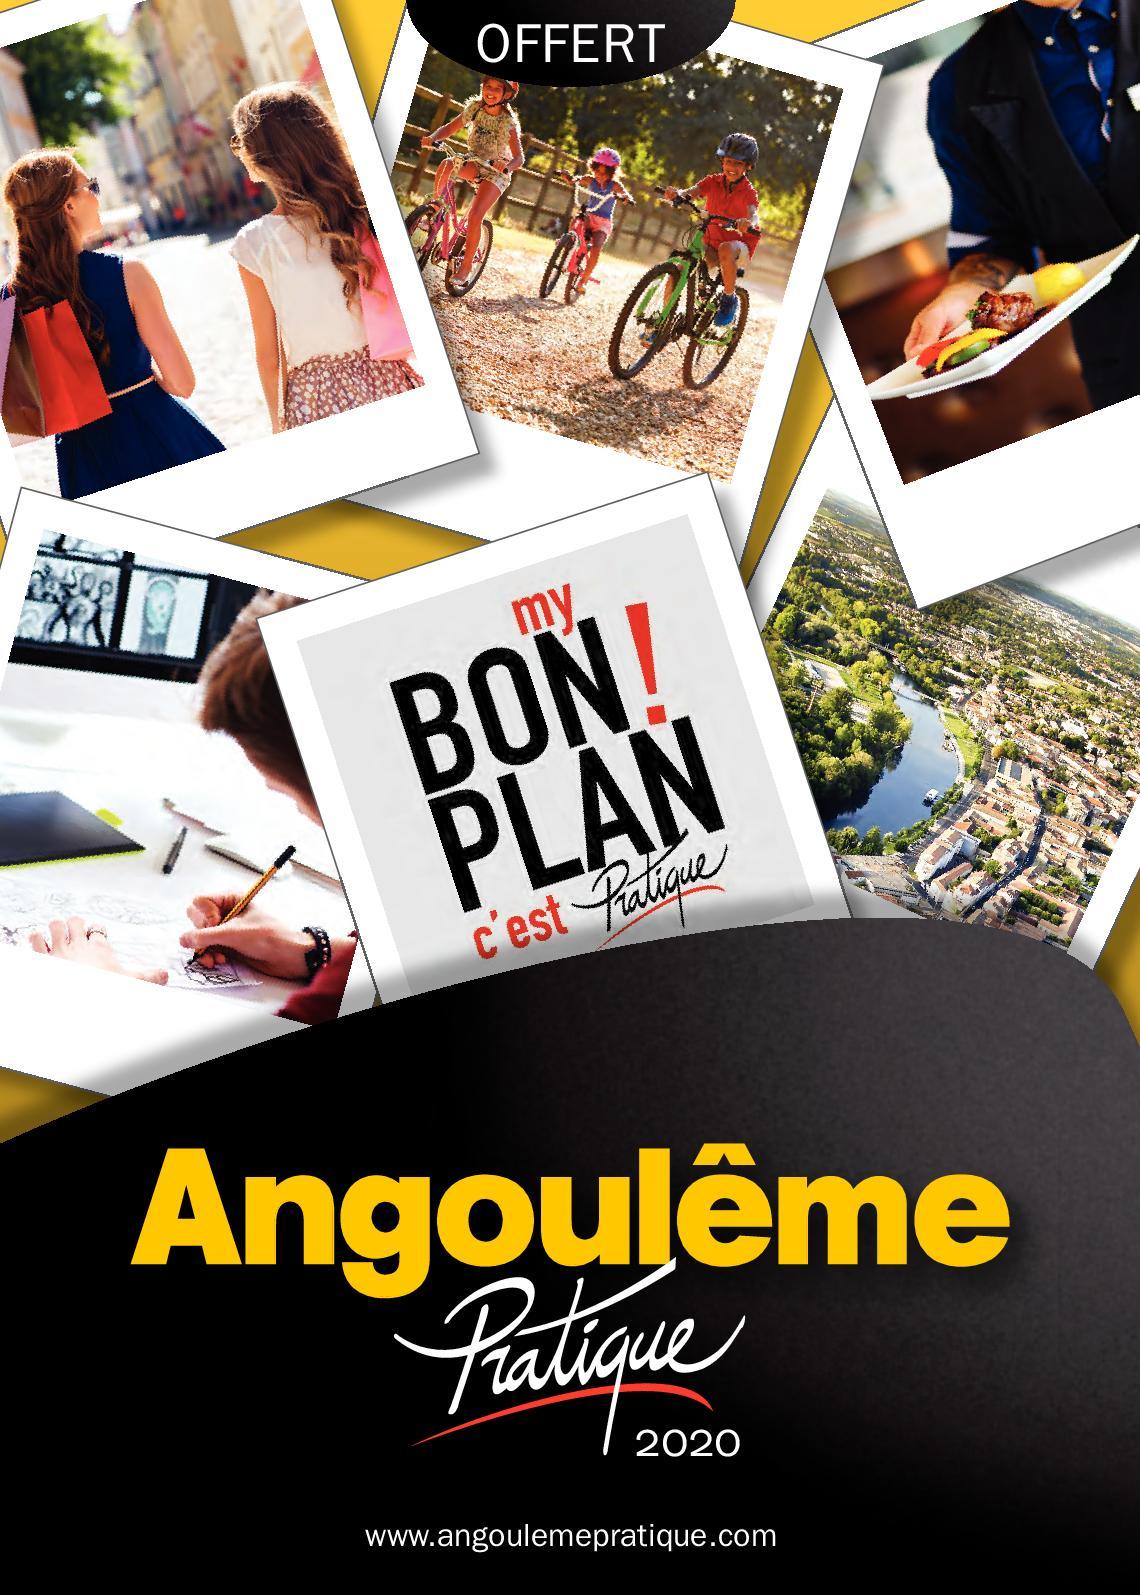 petite annonce rencontre gay organization a Angouleme